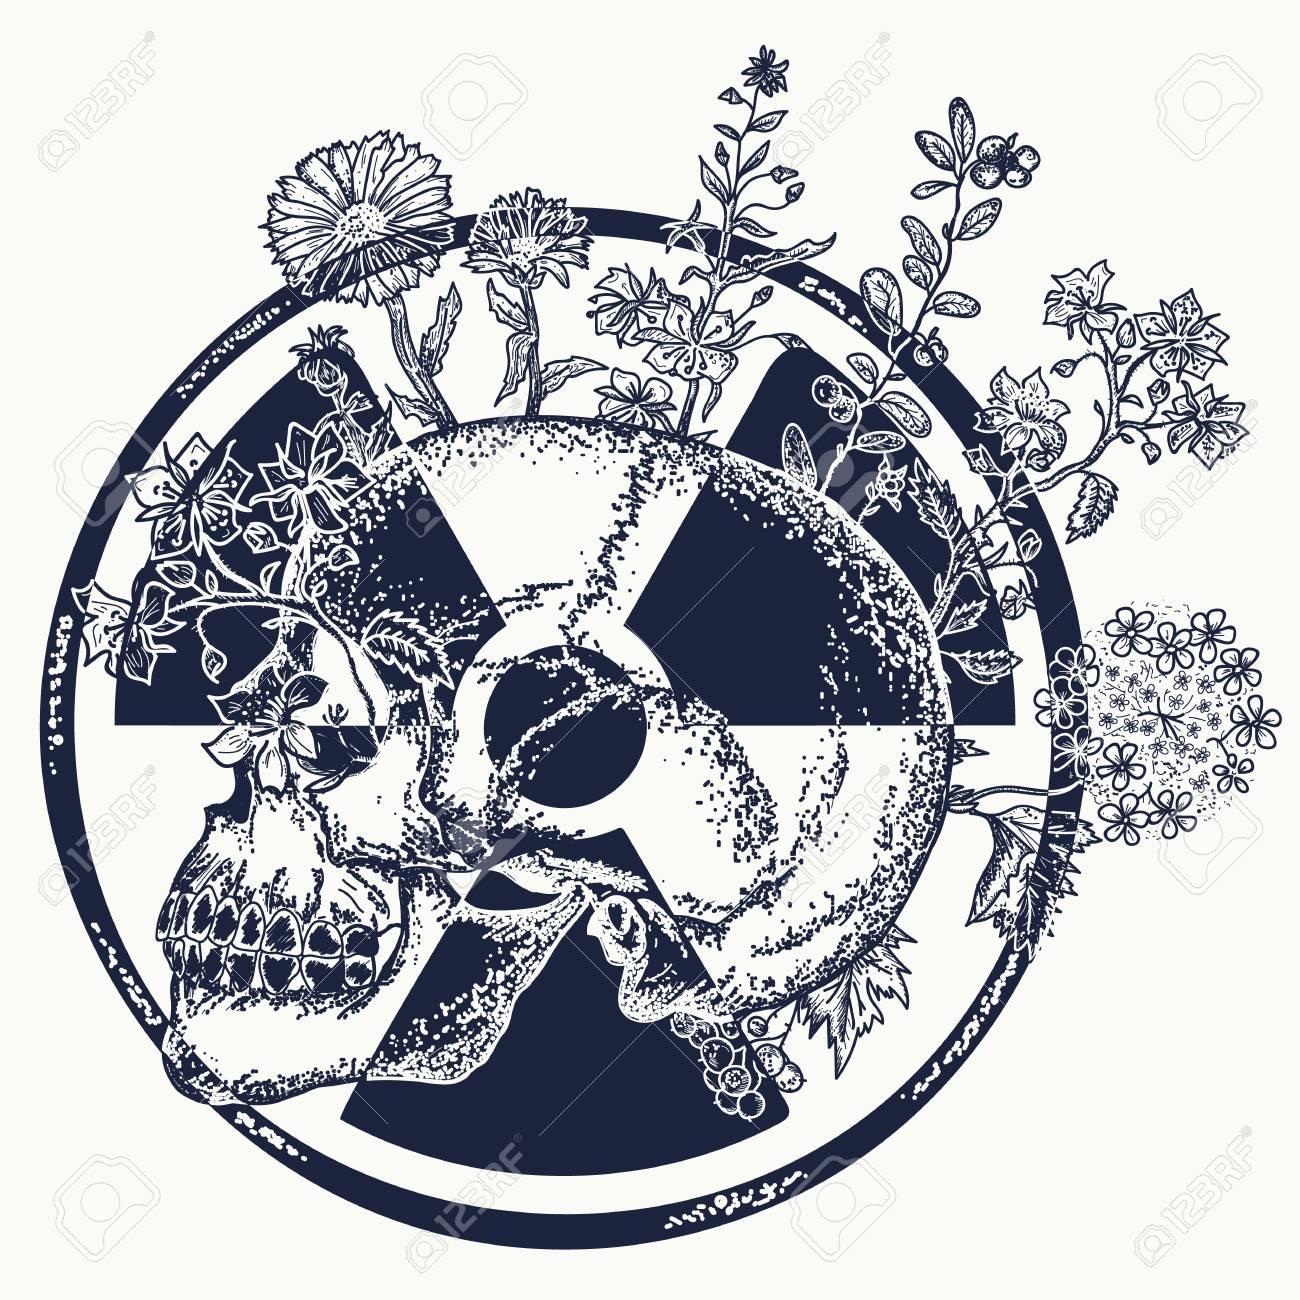 Atomic Skull Tattoo And T Shirt Design Symbol Of Nuclear War